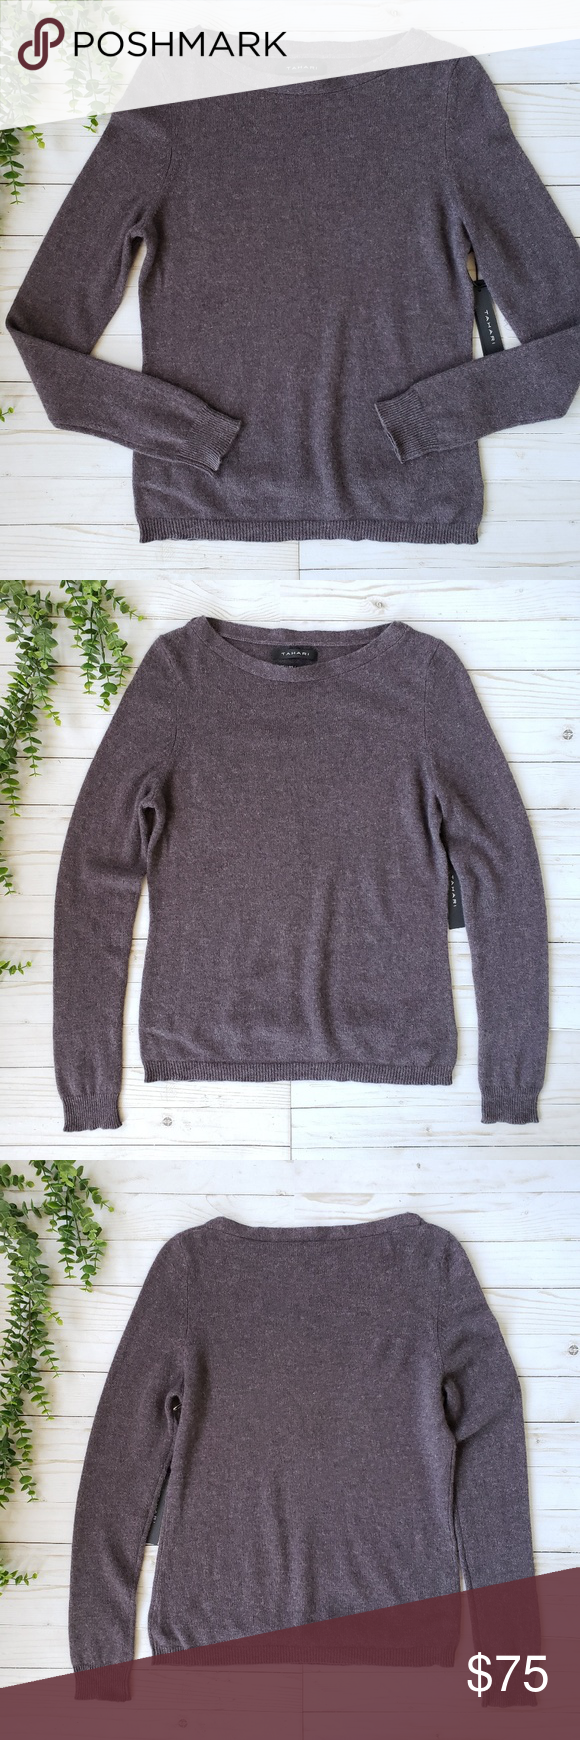 Tahari Pure Luxe 100% Cashmere Sweater   Clothes design